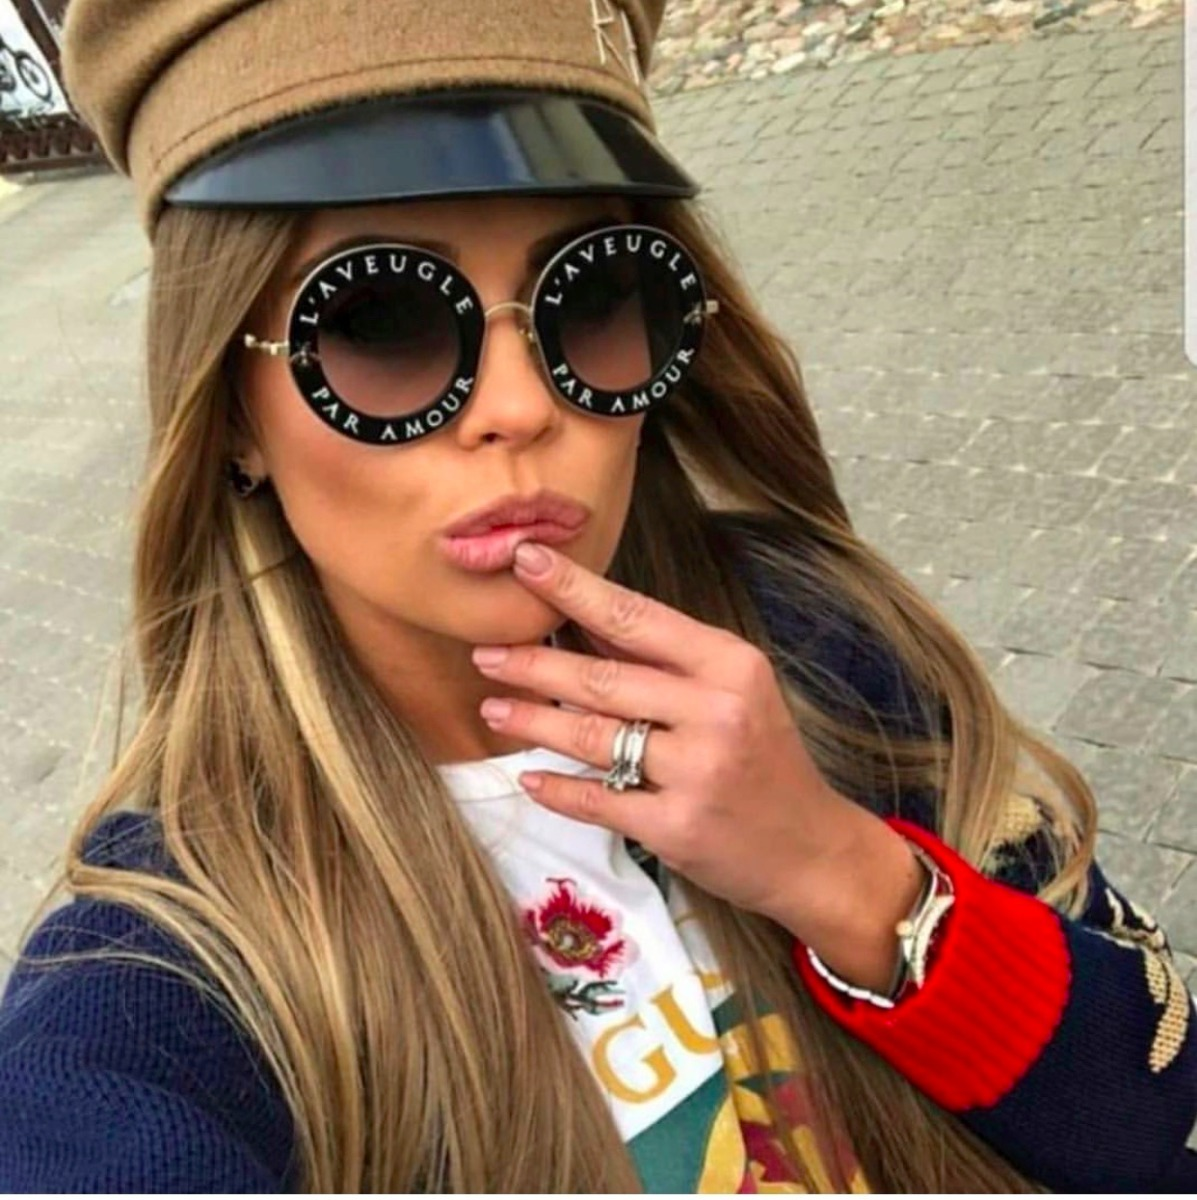 ... 17c37bcf8a9 Óculos De Sol Gucci L Aveugle Redondo Round Feminino - R  429,00 em ... 2b5f109b3f